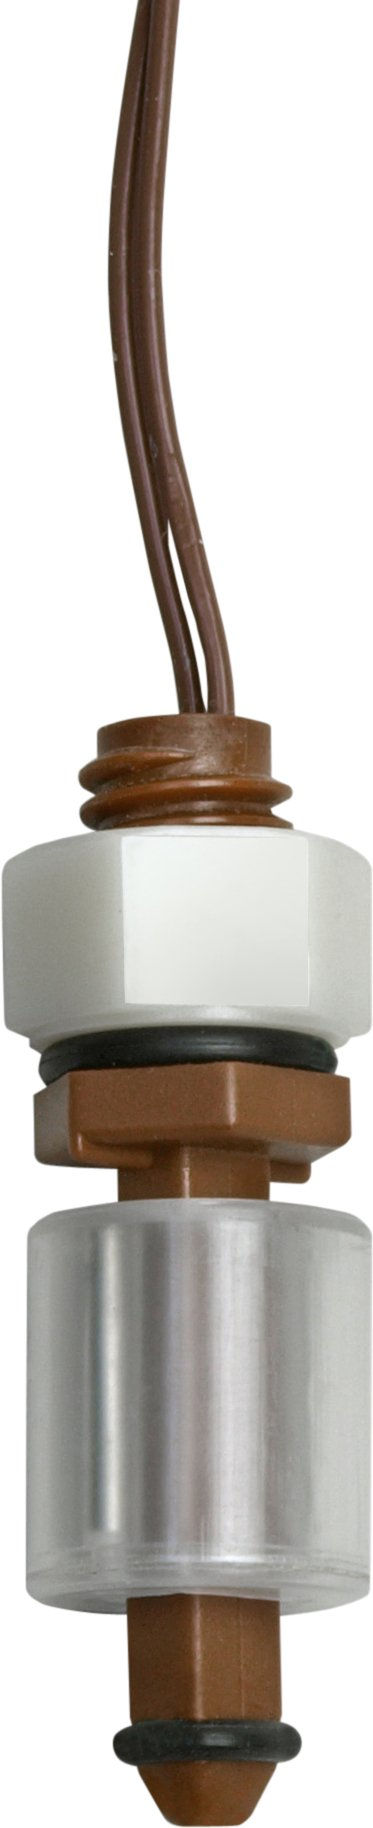 Madison M3326 Plastic Normally Closed Subminiature Liquid Level Float Switch with Polypropylene Stem, 15 VA SPST, 3/8''-16 UNC, 50 psig Pressure